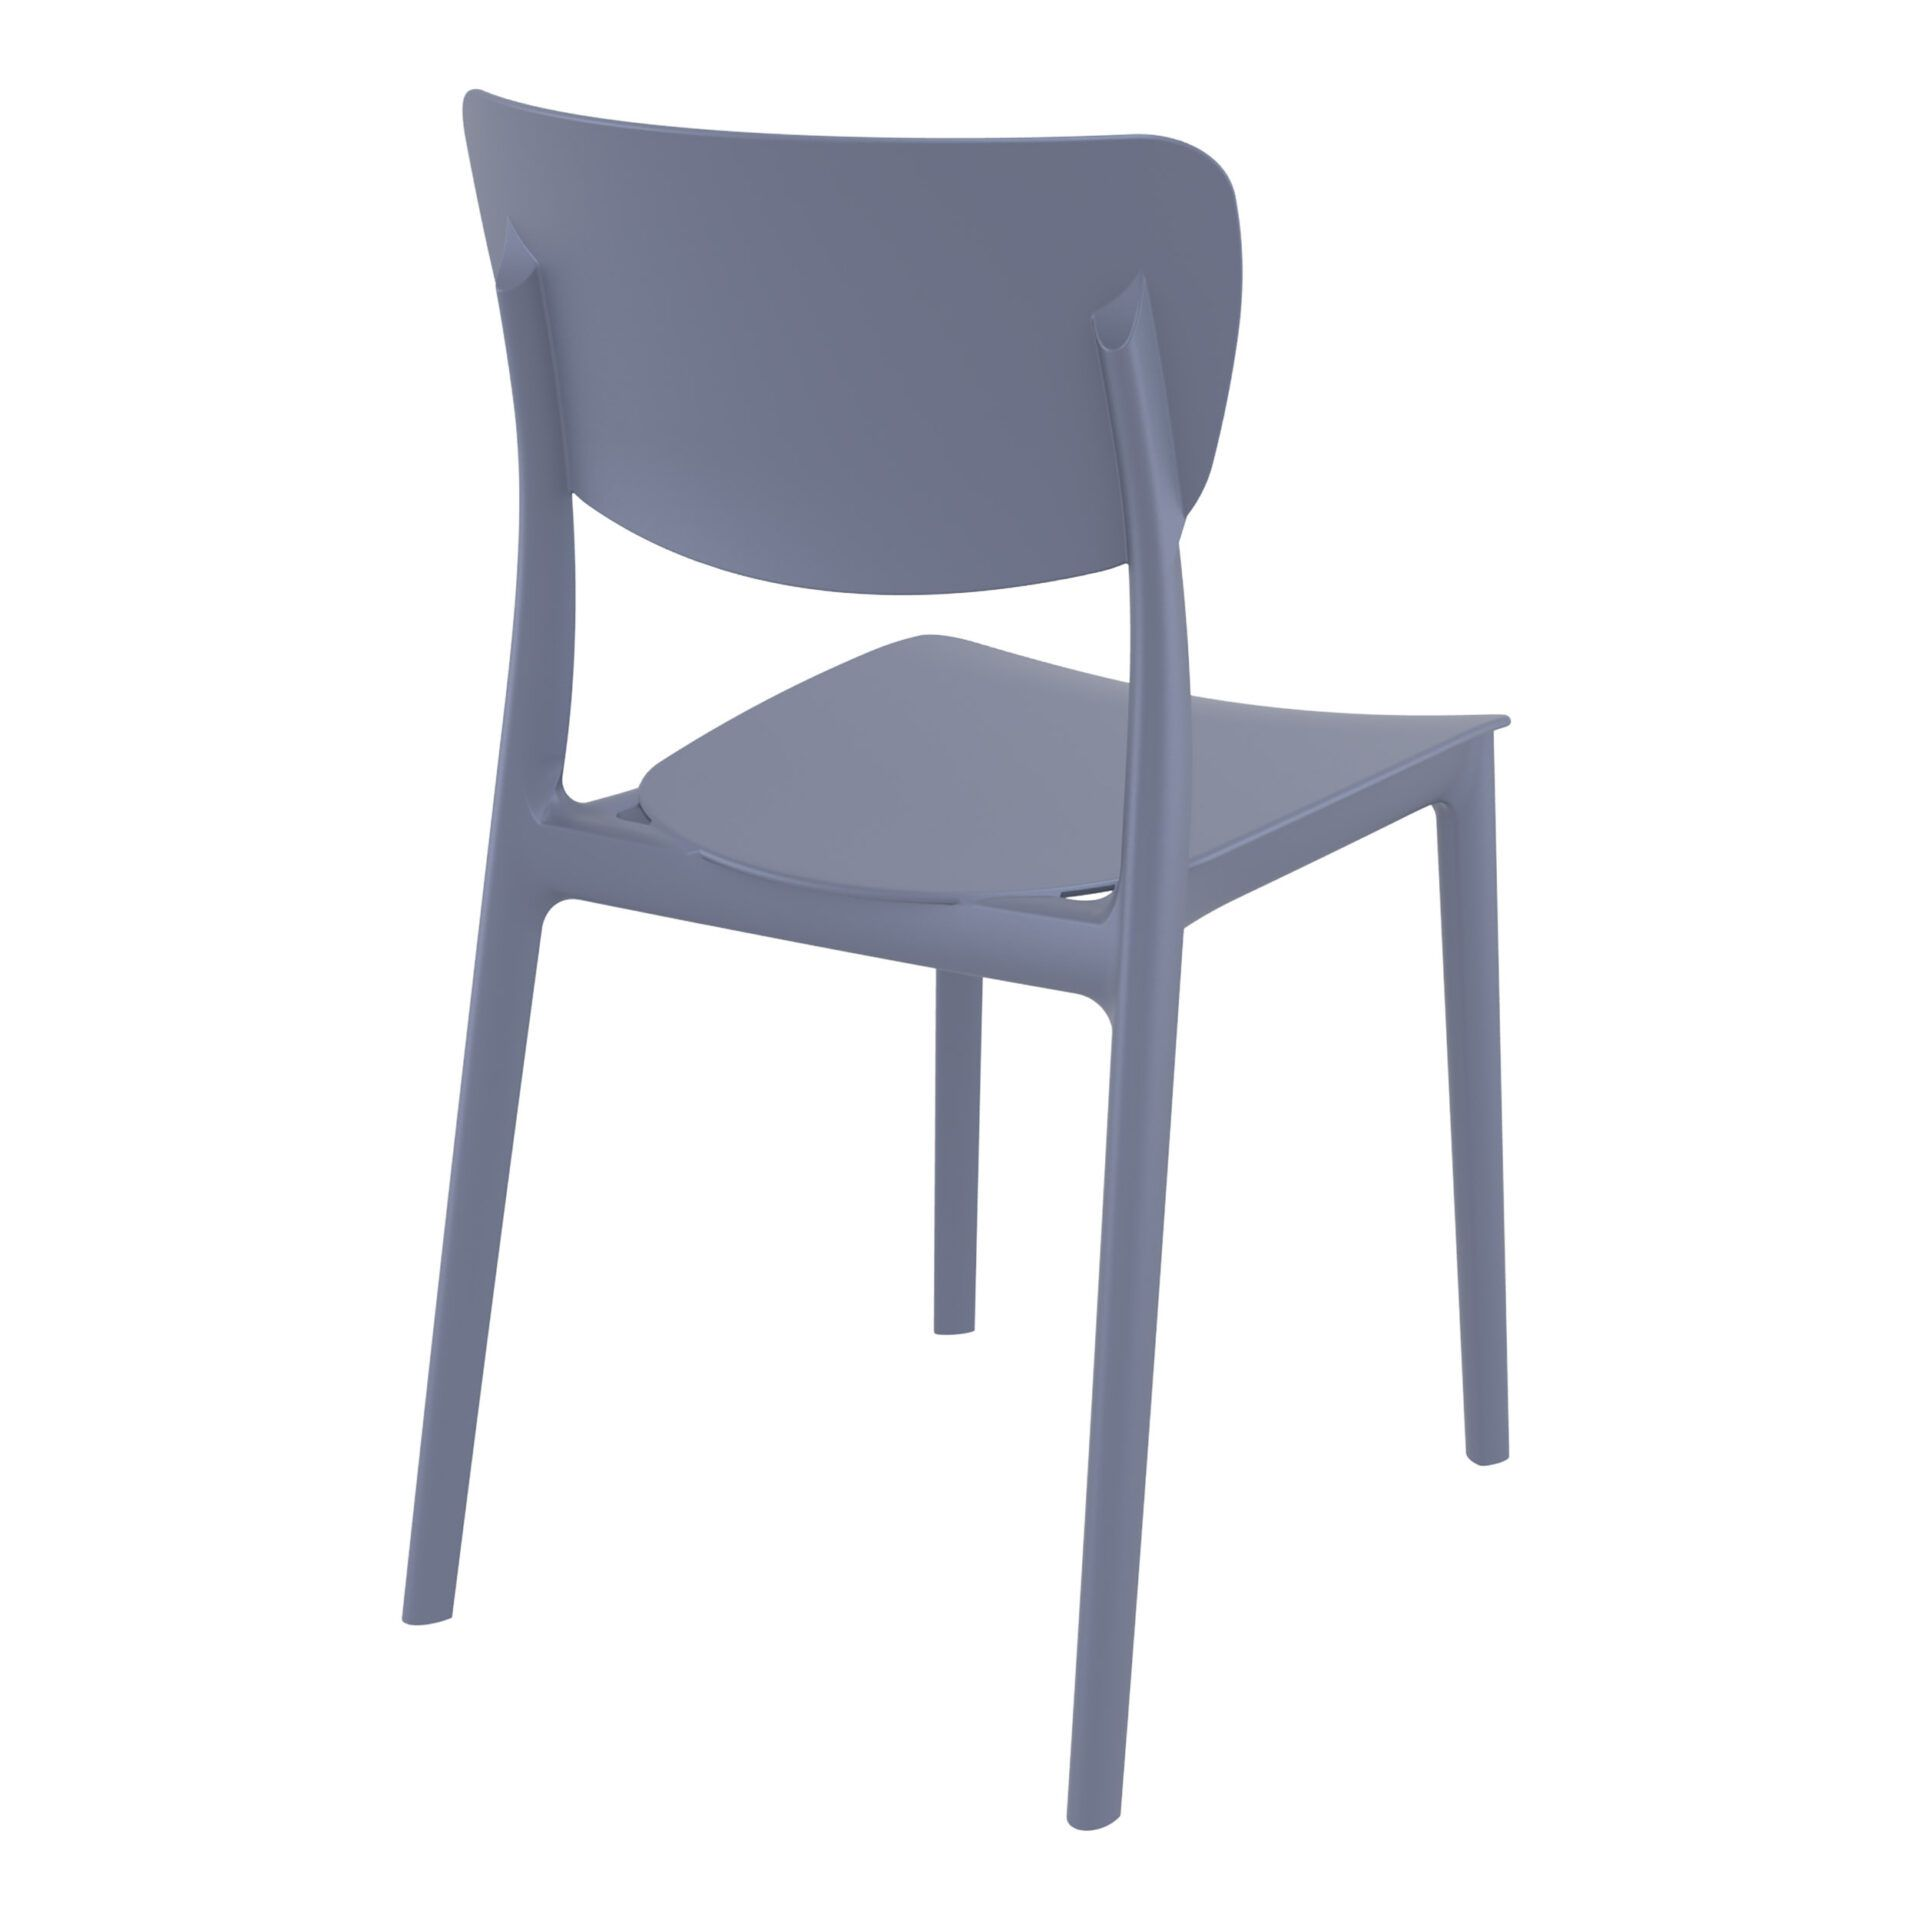 polypropylene outdoor dining monna chair darkgrey back side